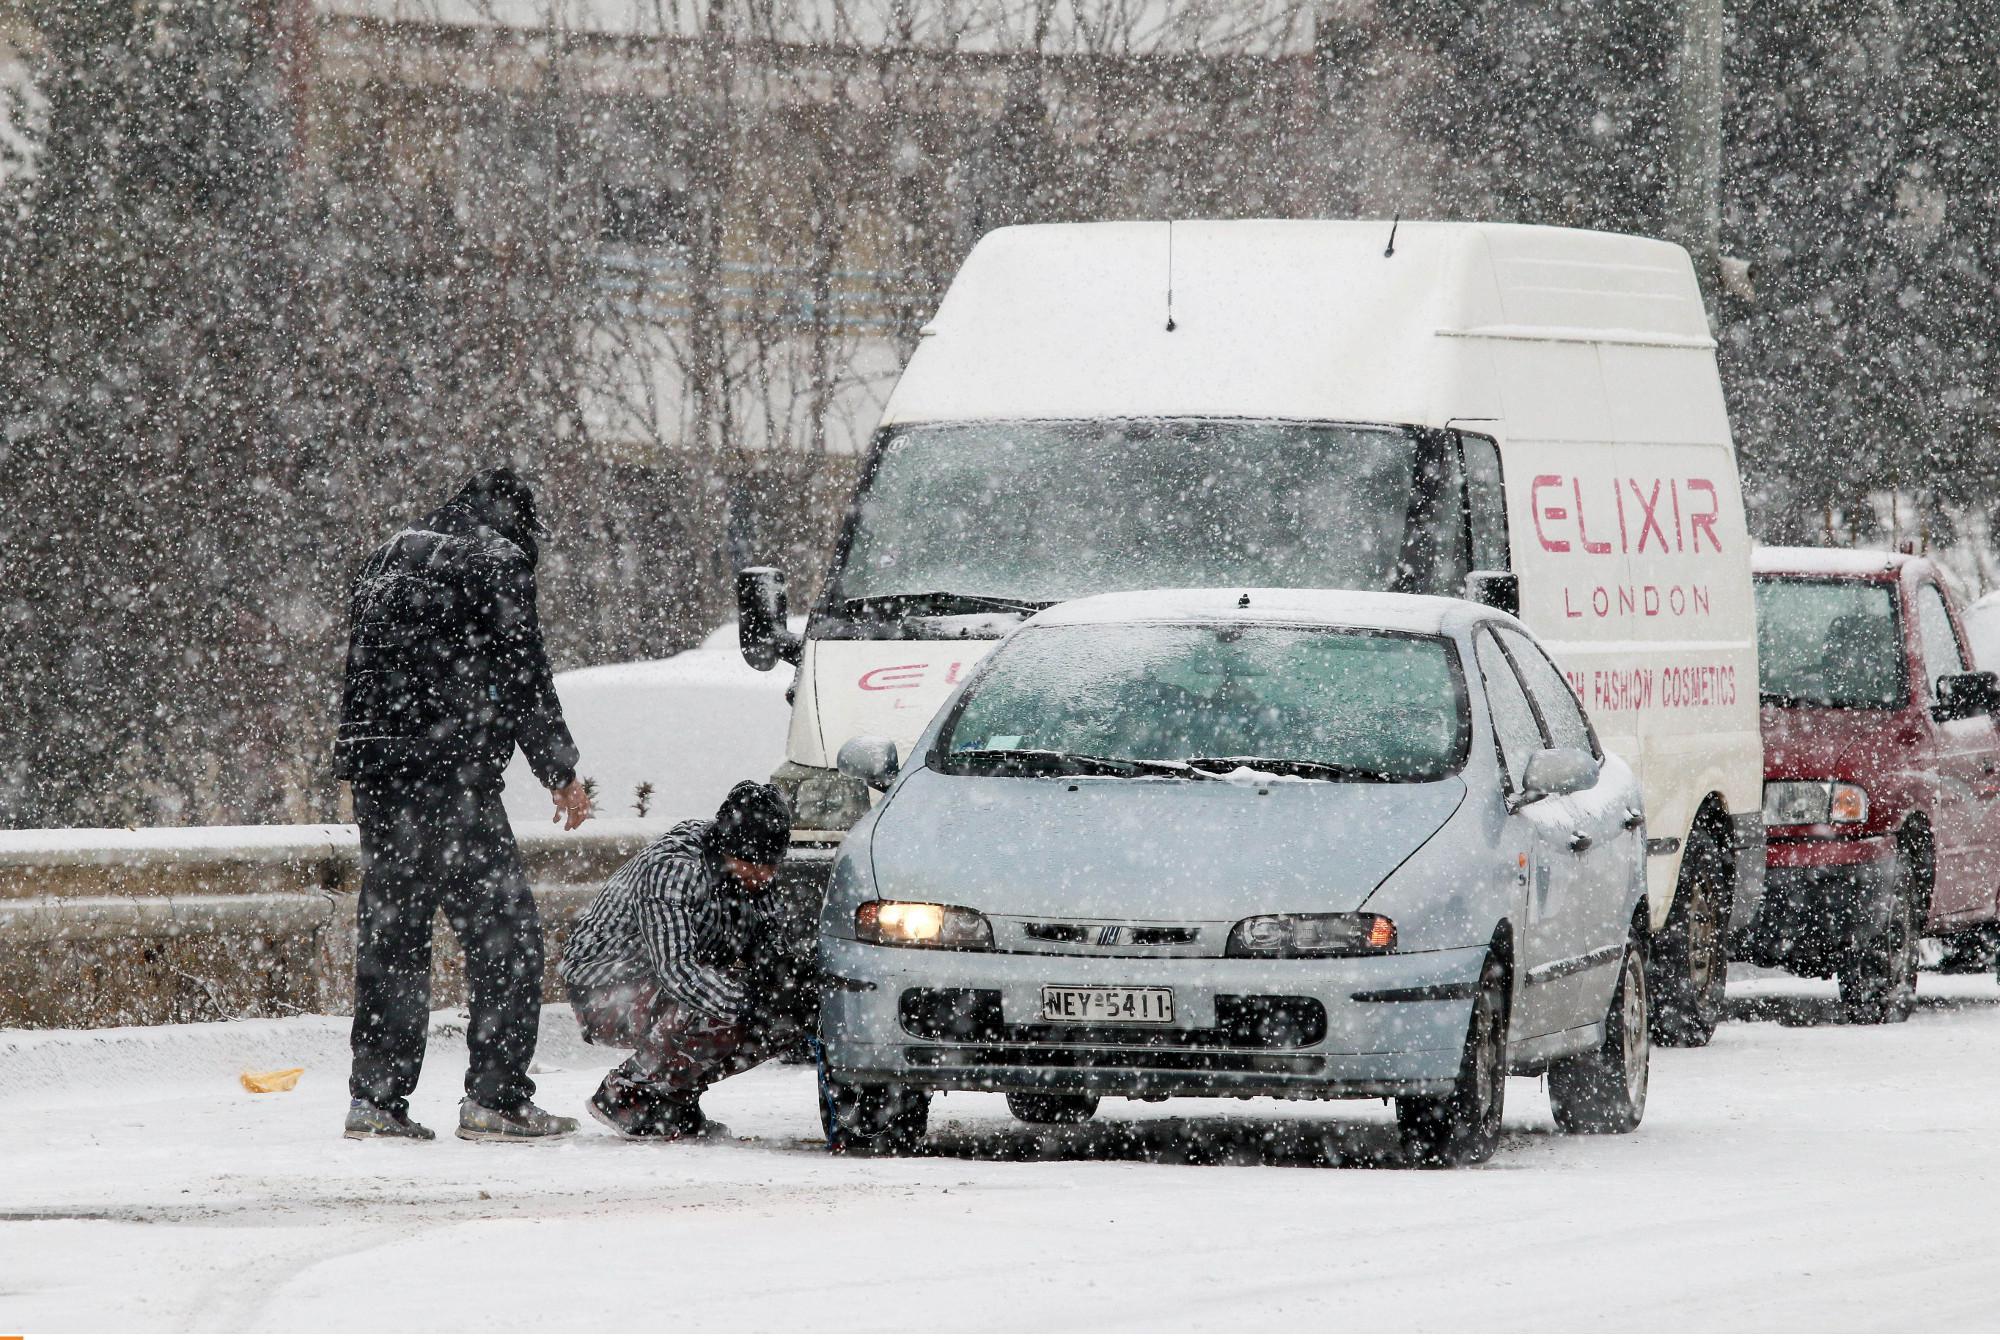 thessaloniki-botiliarisma3-1300 Ατελείωτες ώρες στο μποτιλιάρισμα για τους οδηγούς στη Θεσσαλονίκη [εικόνες]